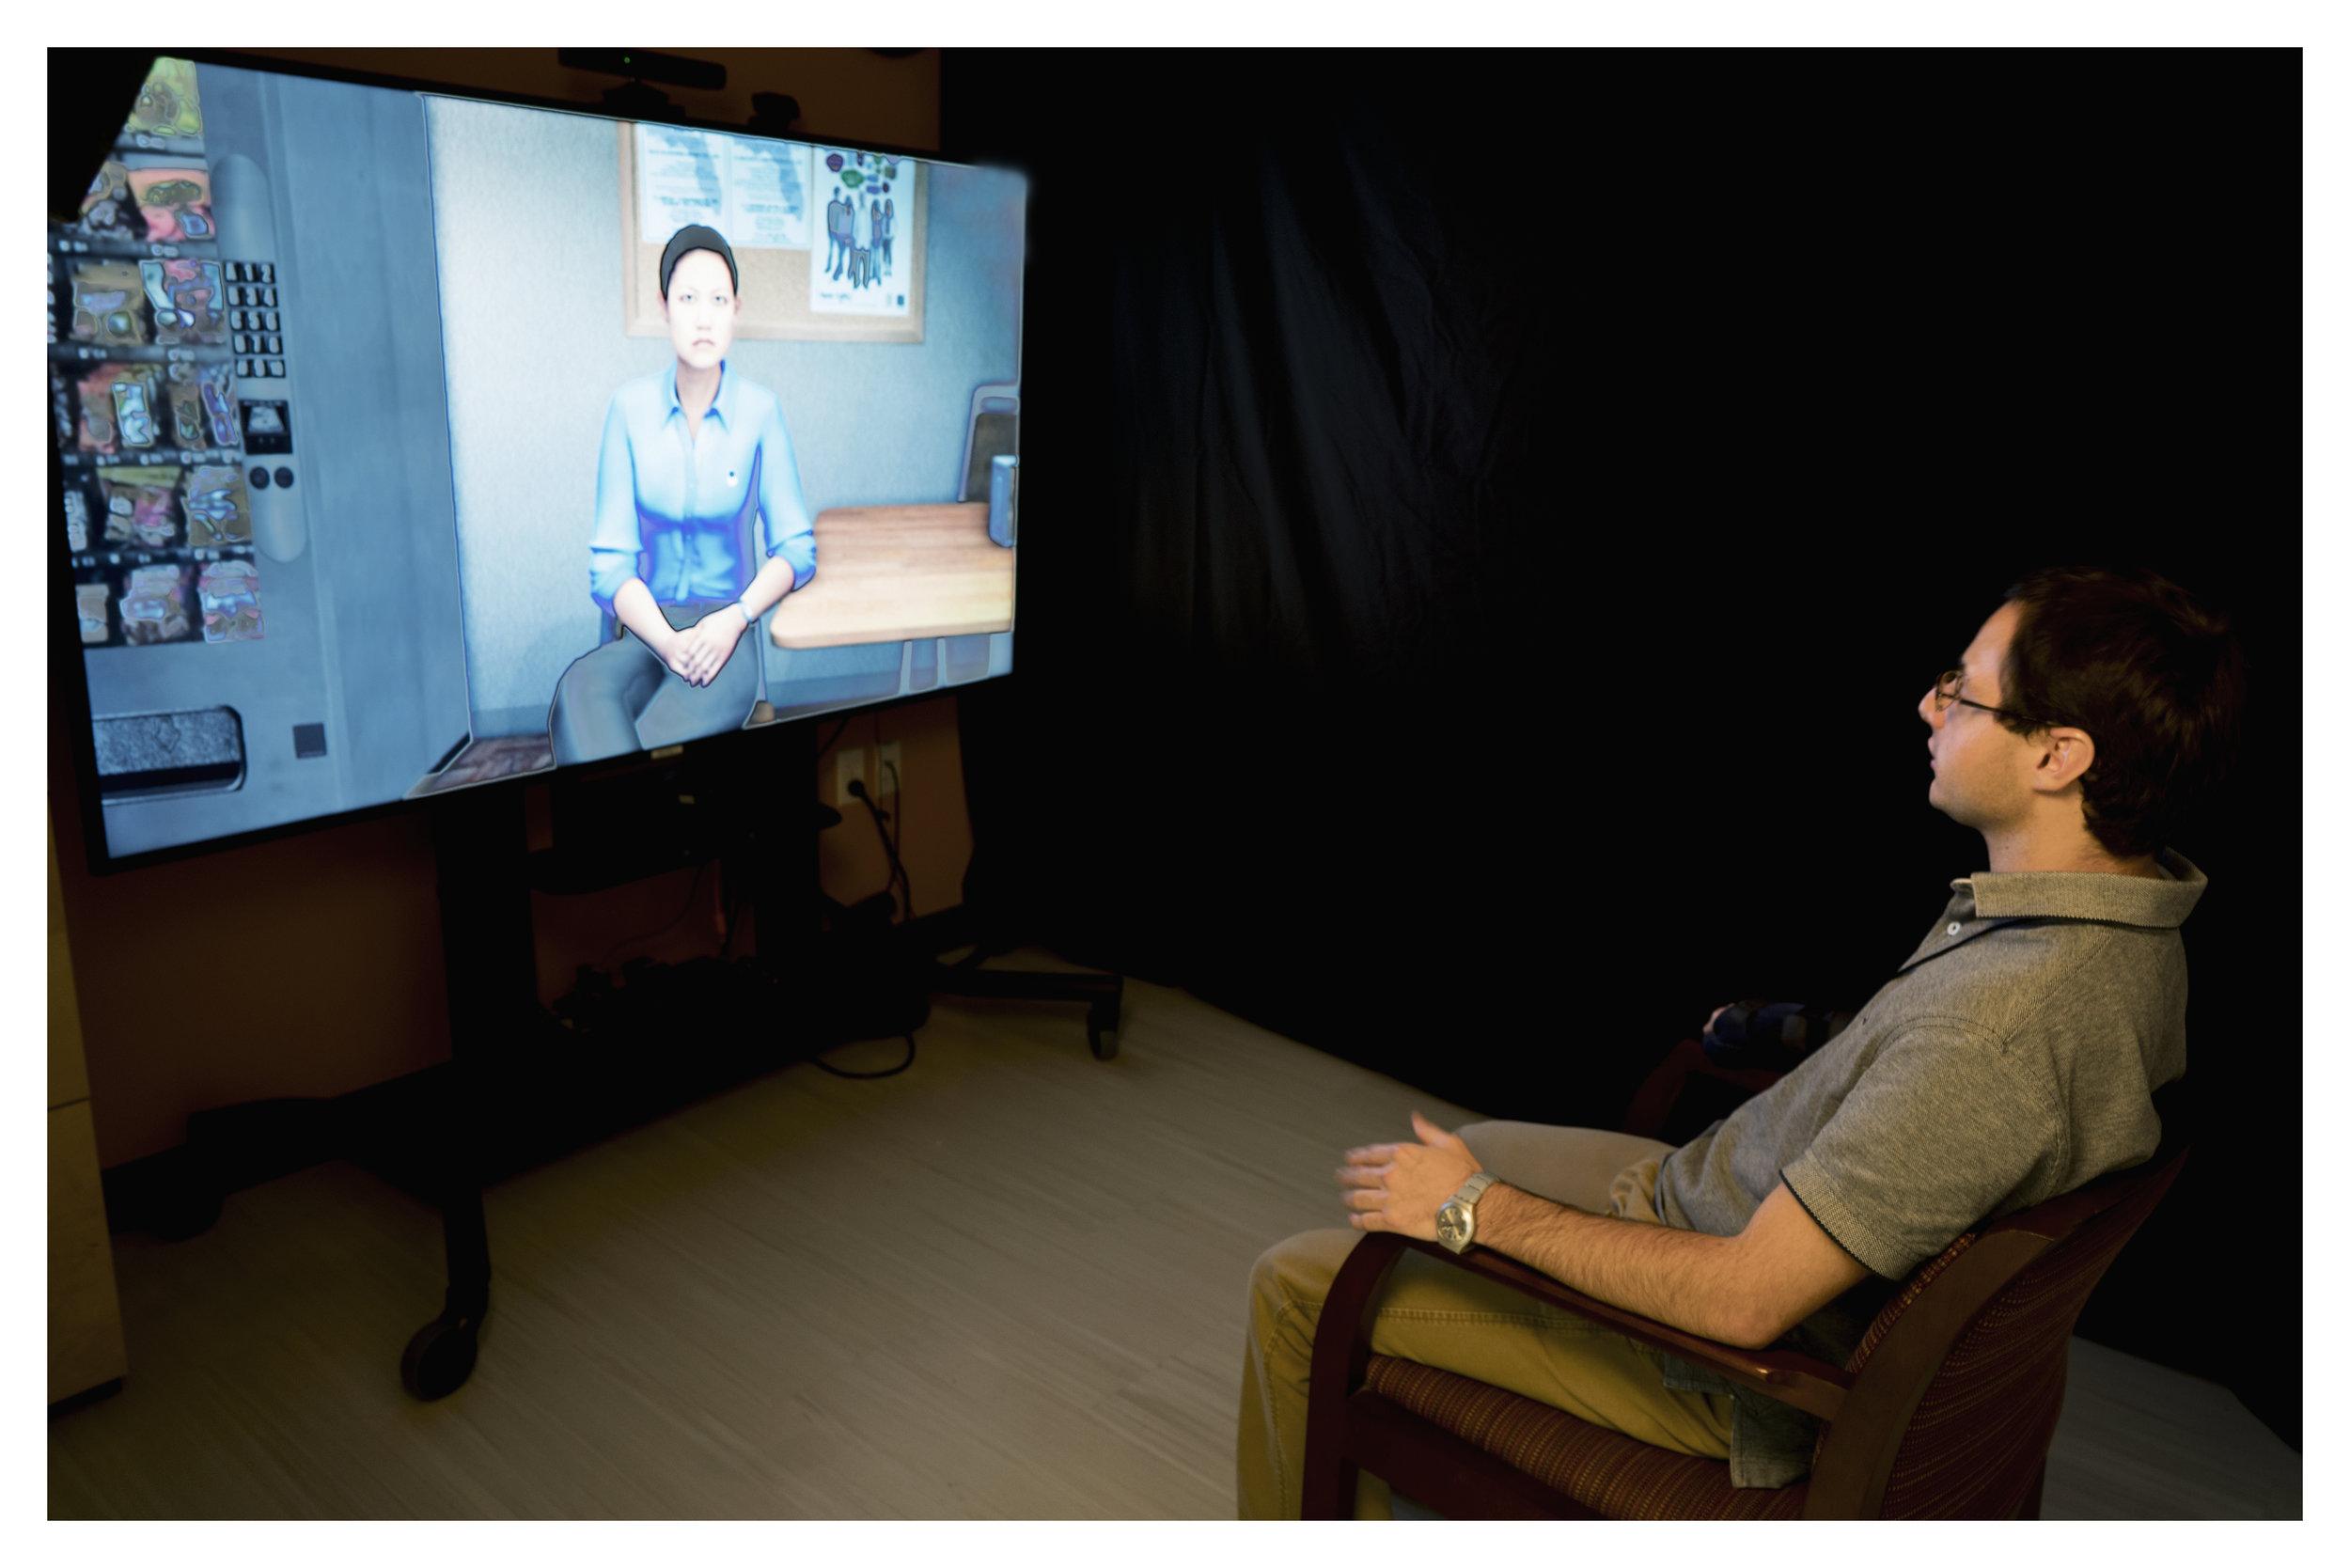 Eric using VITA DMF virtual job interviewing software.